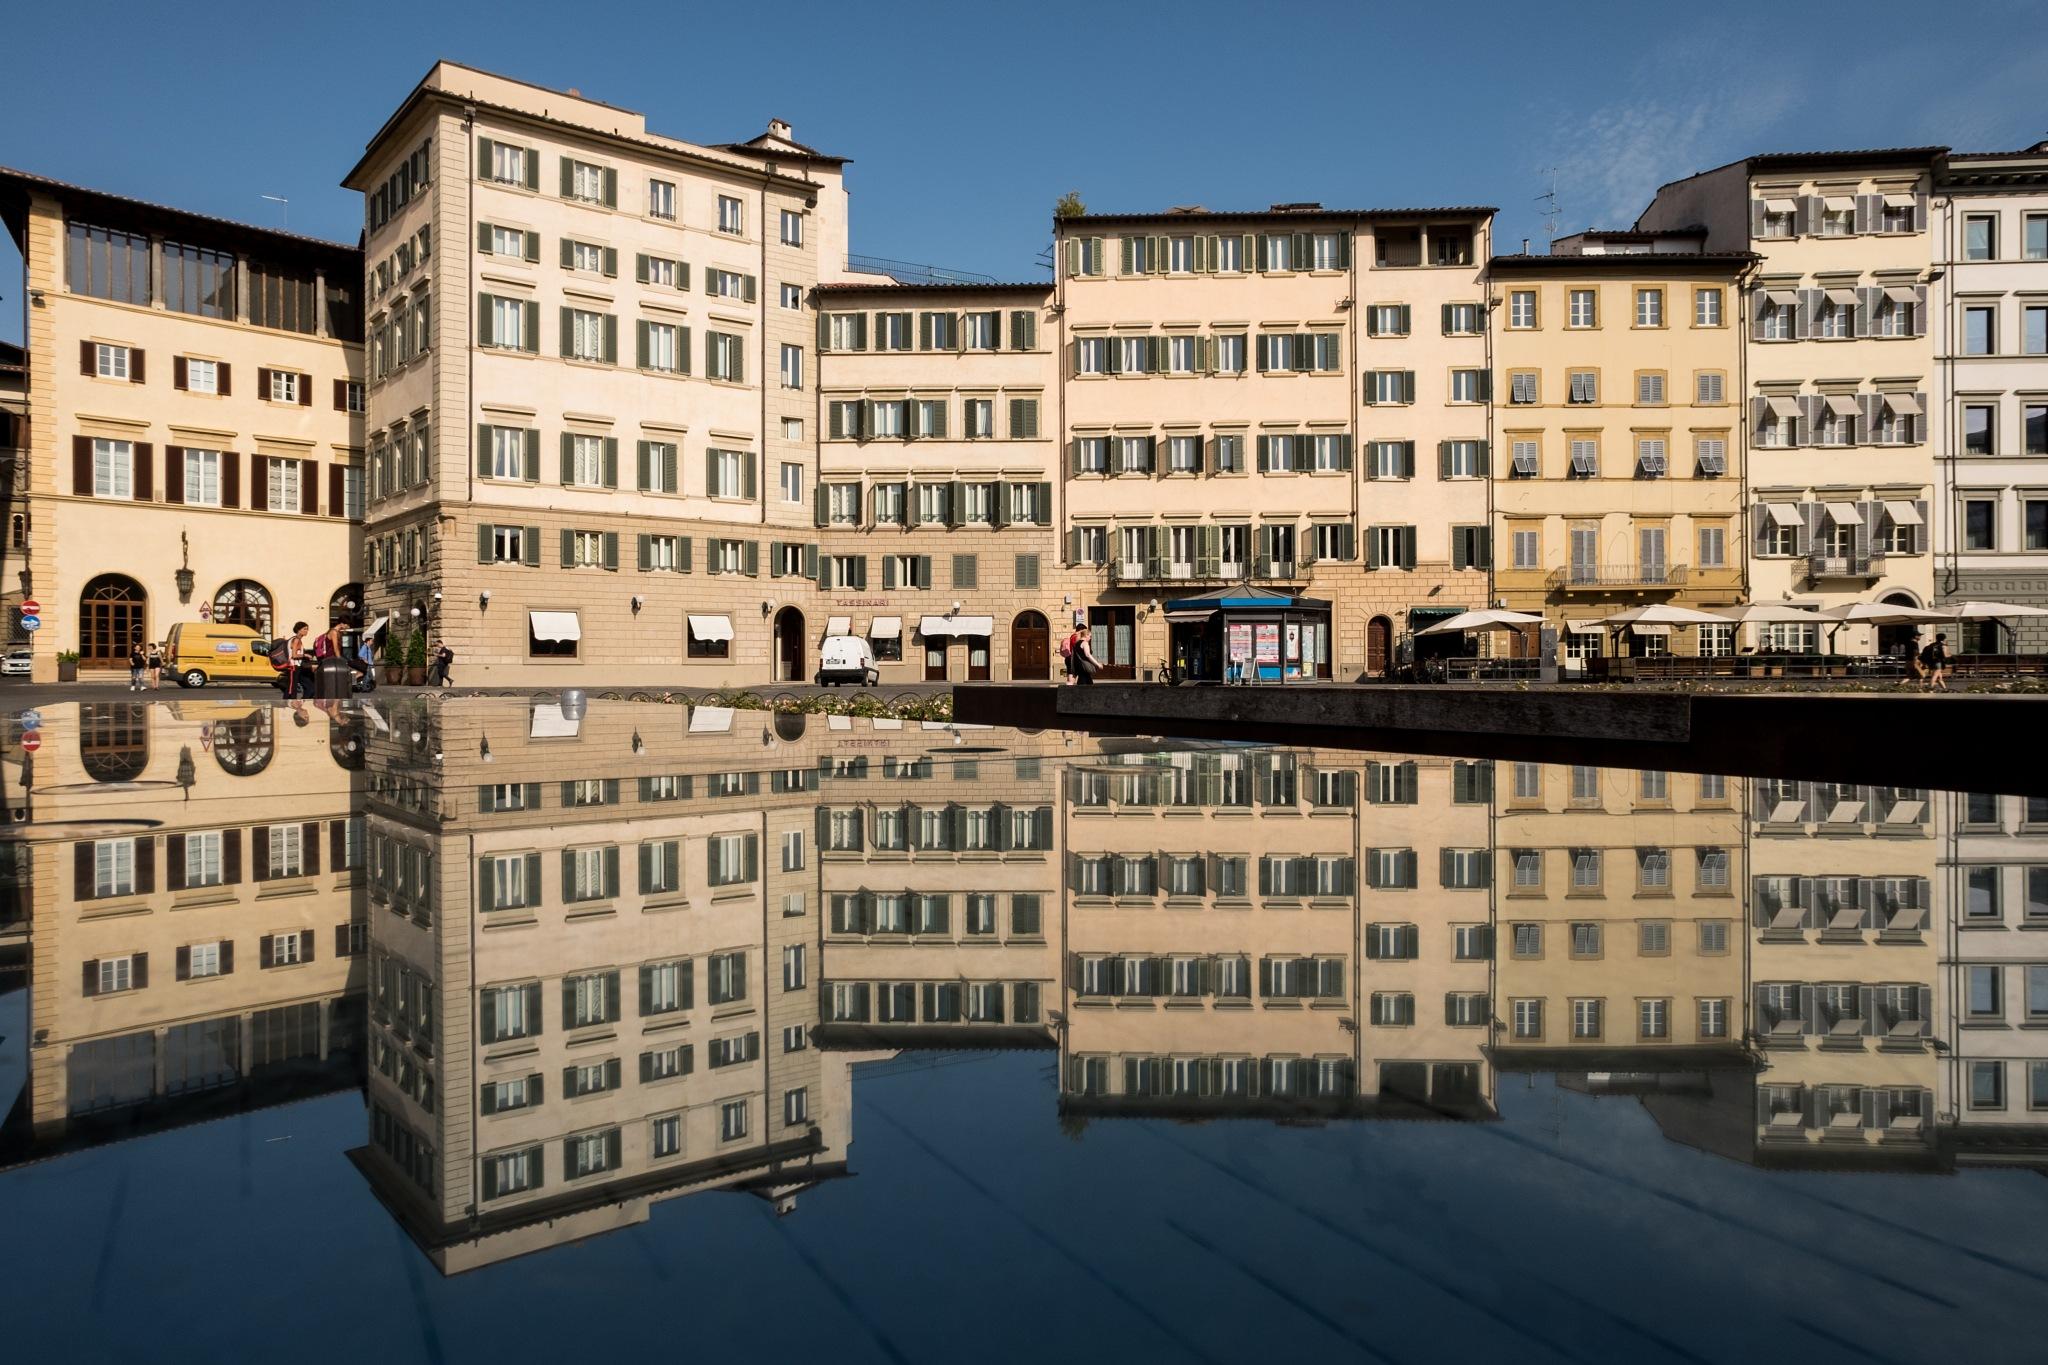 Piazza Santa Maria Novella by Paul Hoogeveen Photography